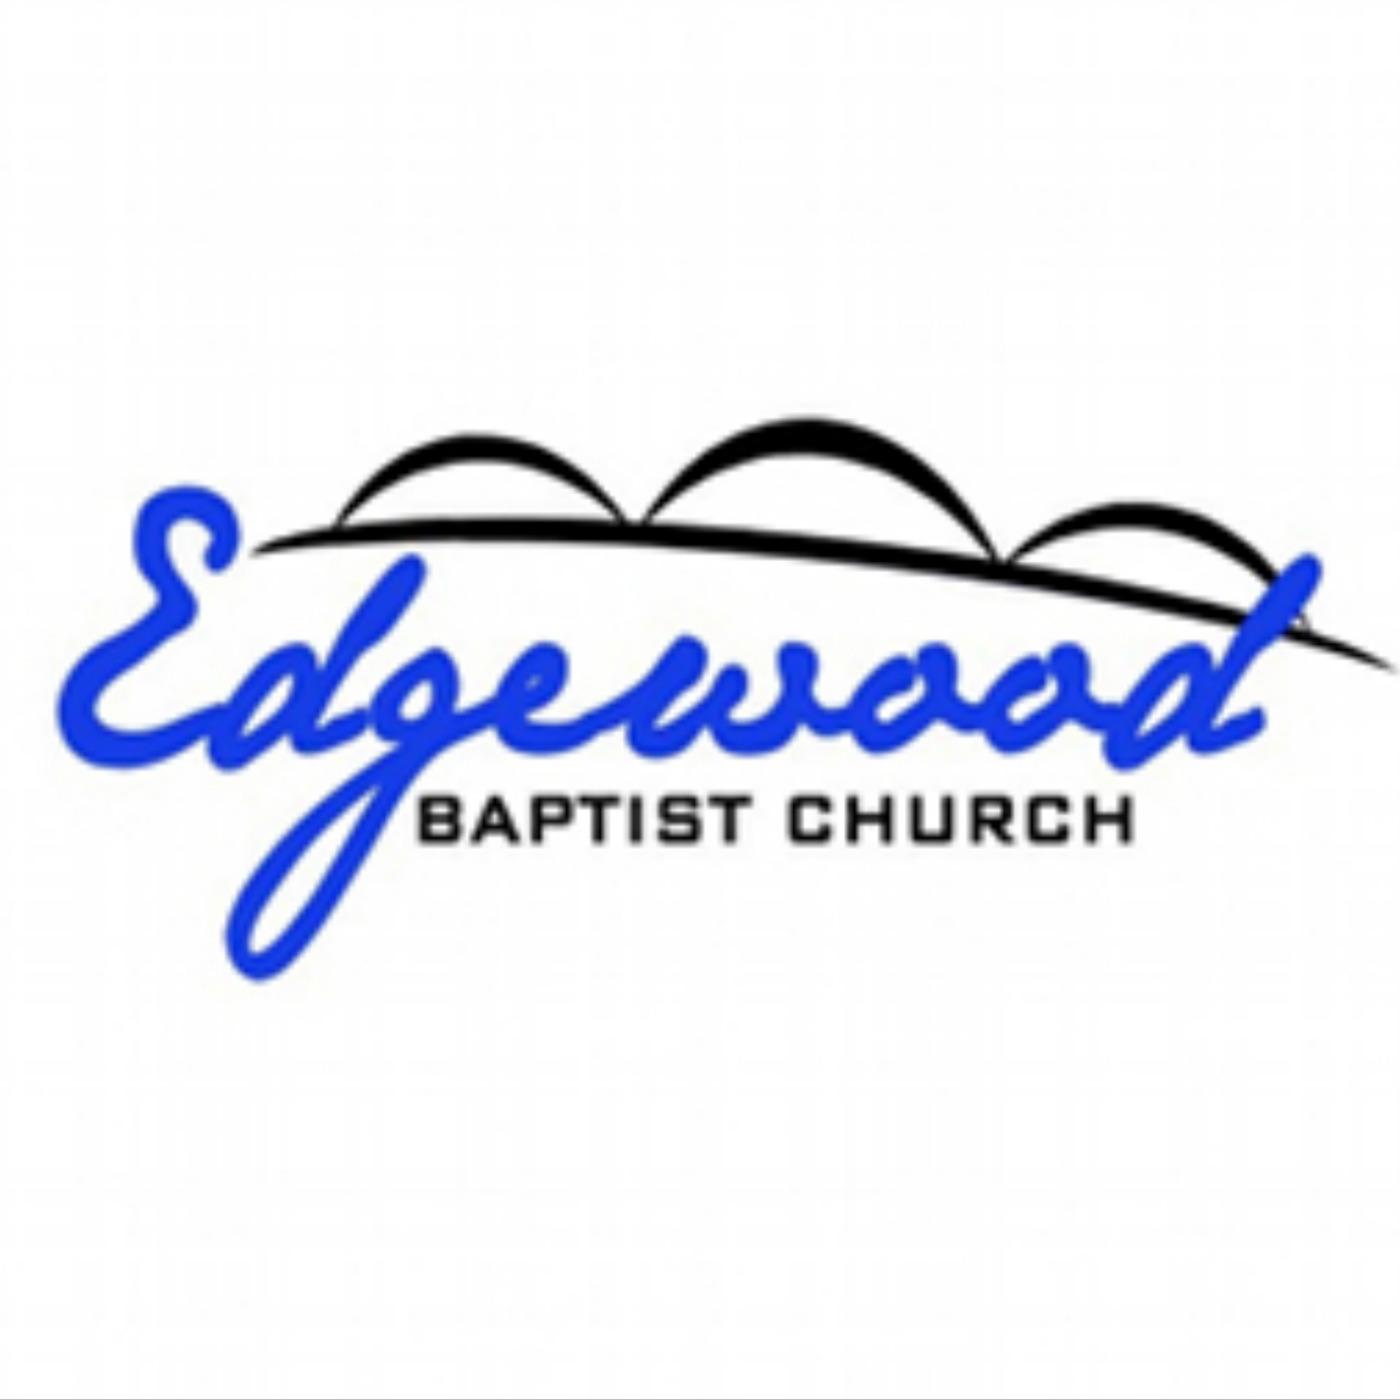 Edgewood Baptist Church Rock Island, IL